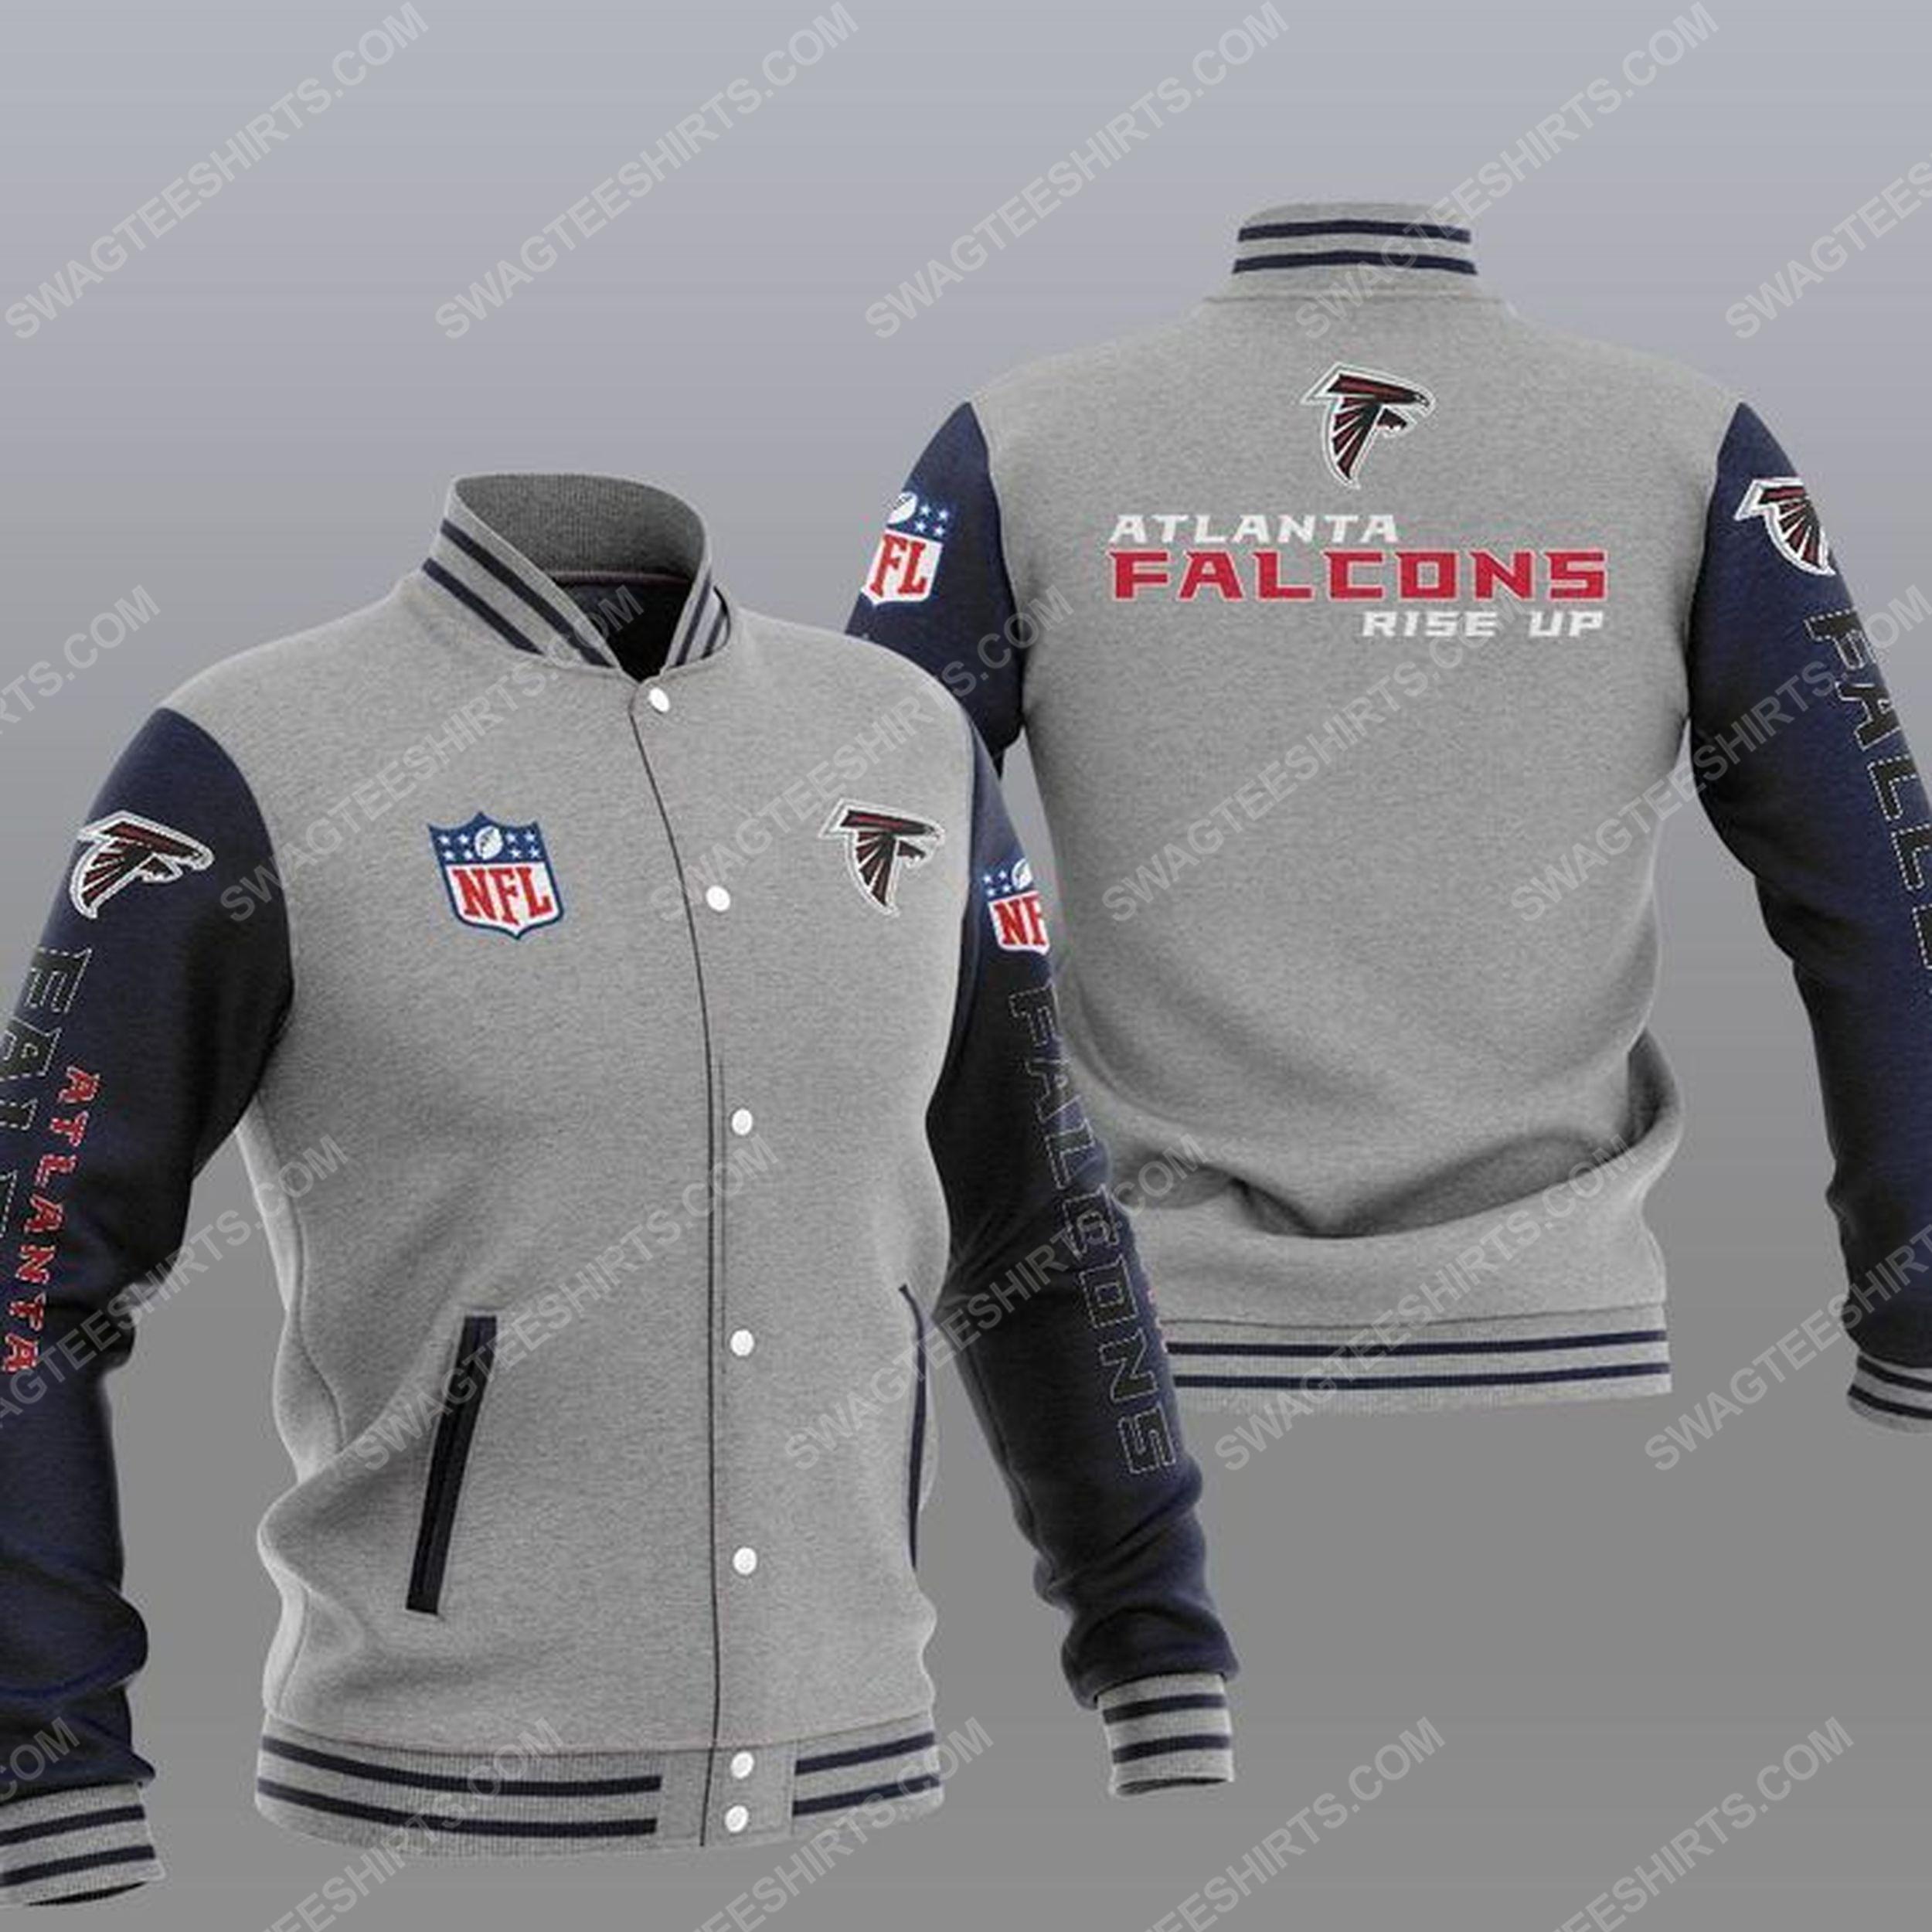 The atlanta falcons rise up all over print baseball jacket - gray 1